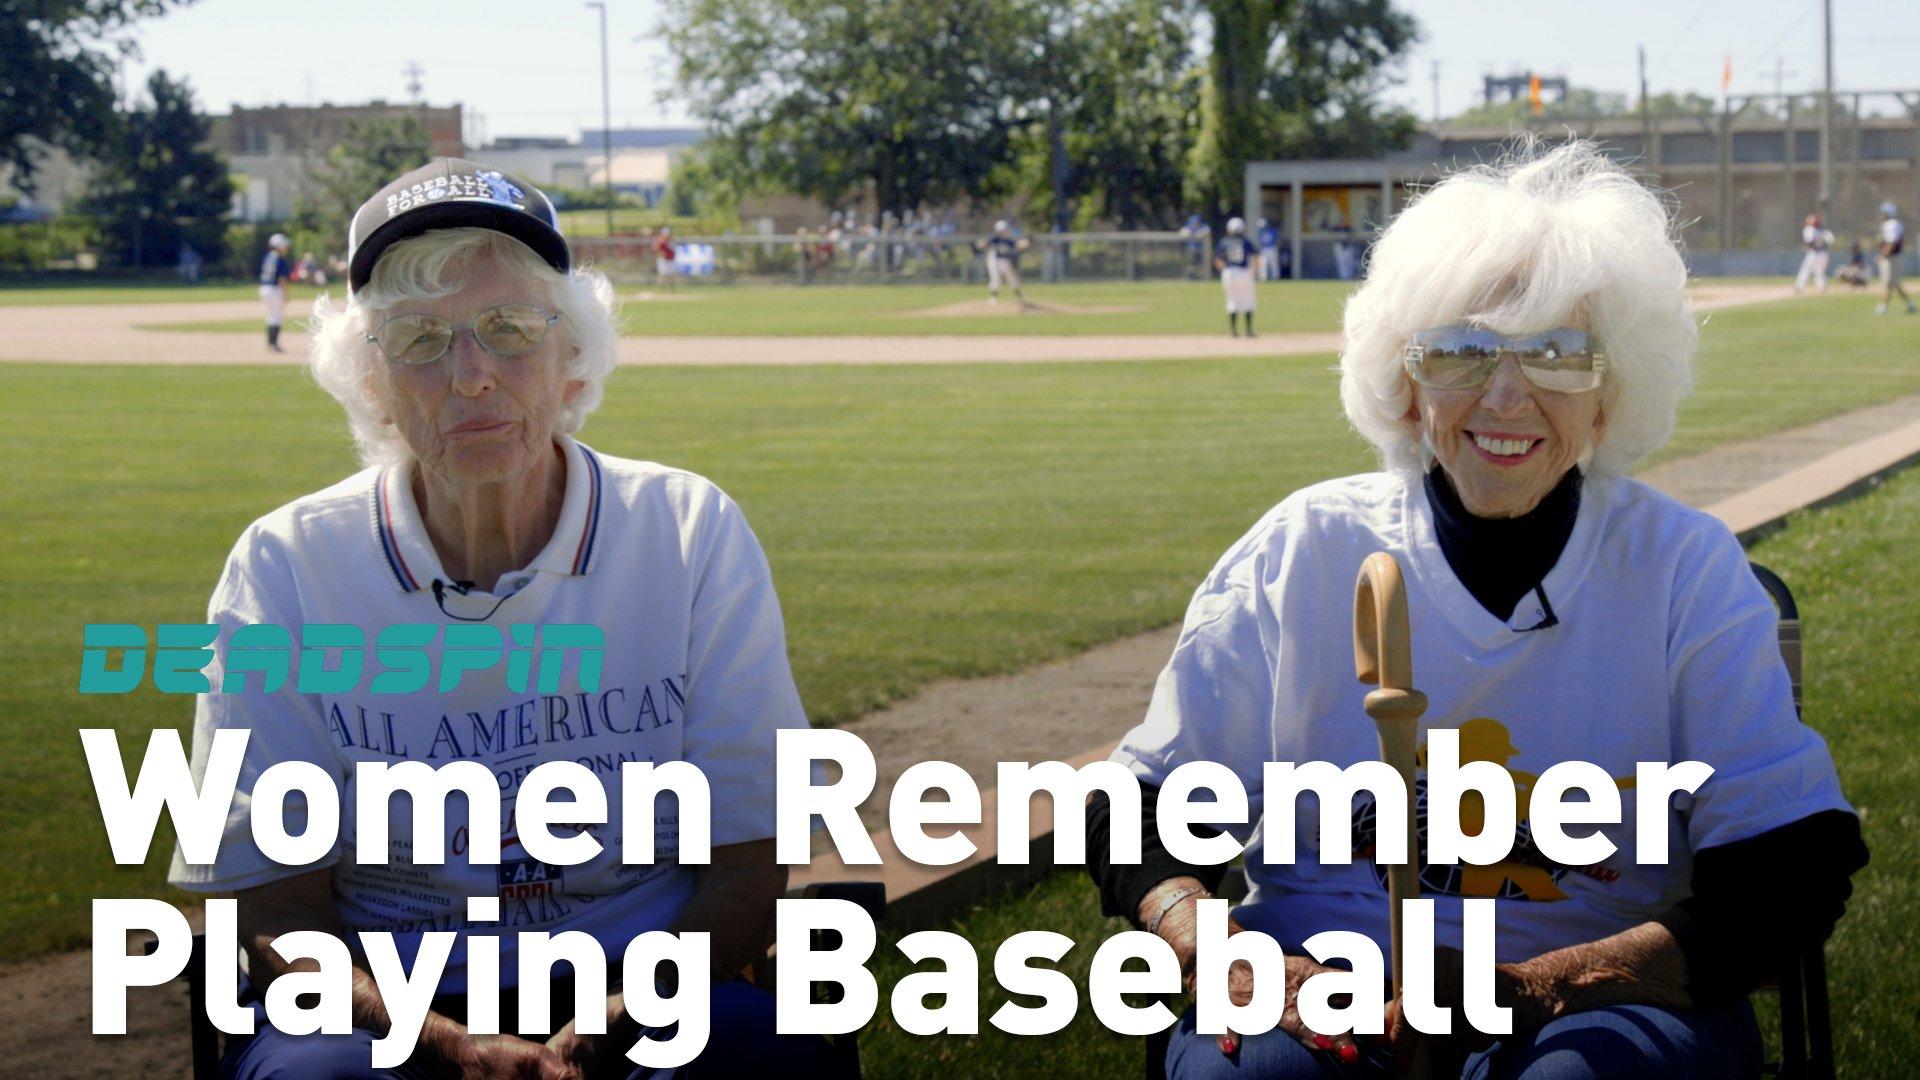 When women played baseball https://t.co/r7q5D7lGxD https://t.co/6fZosFe1pD